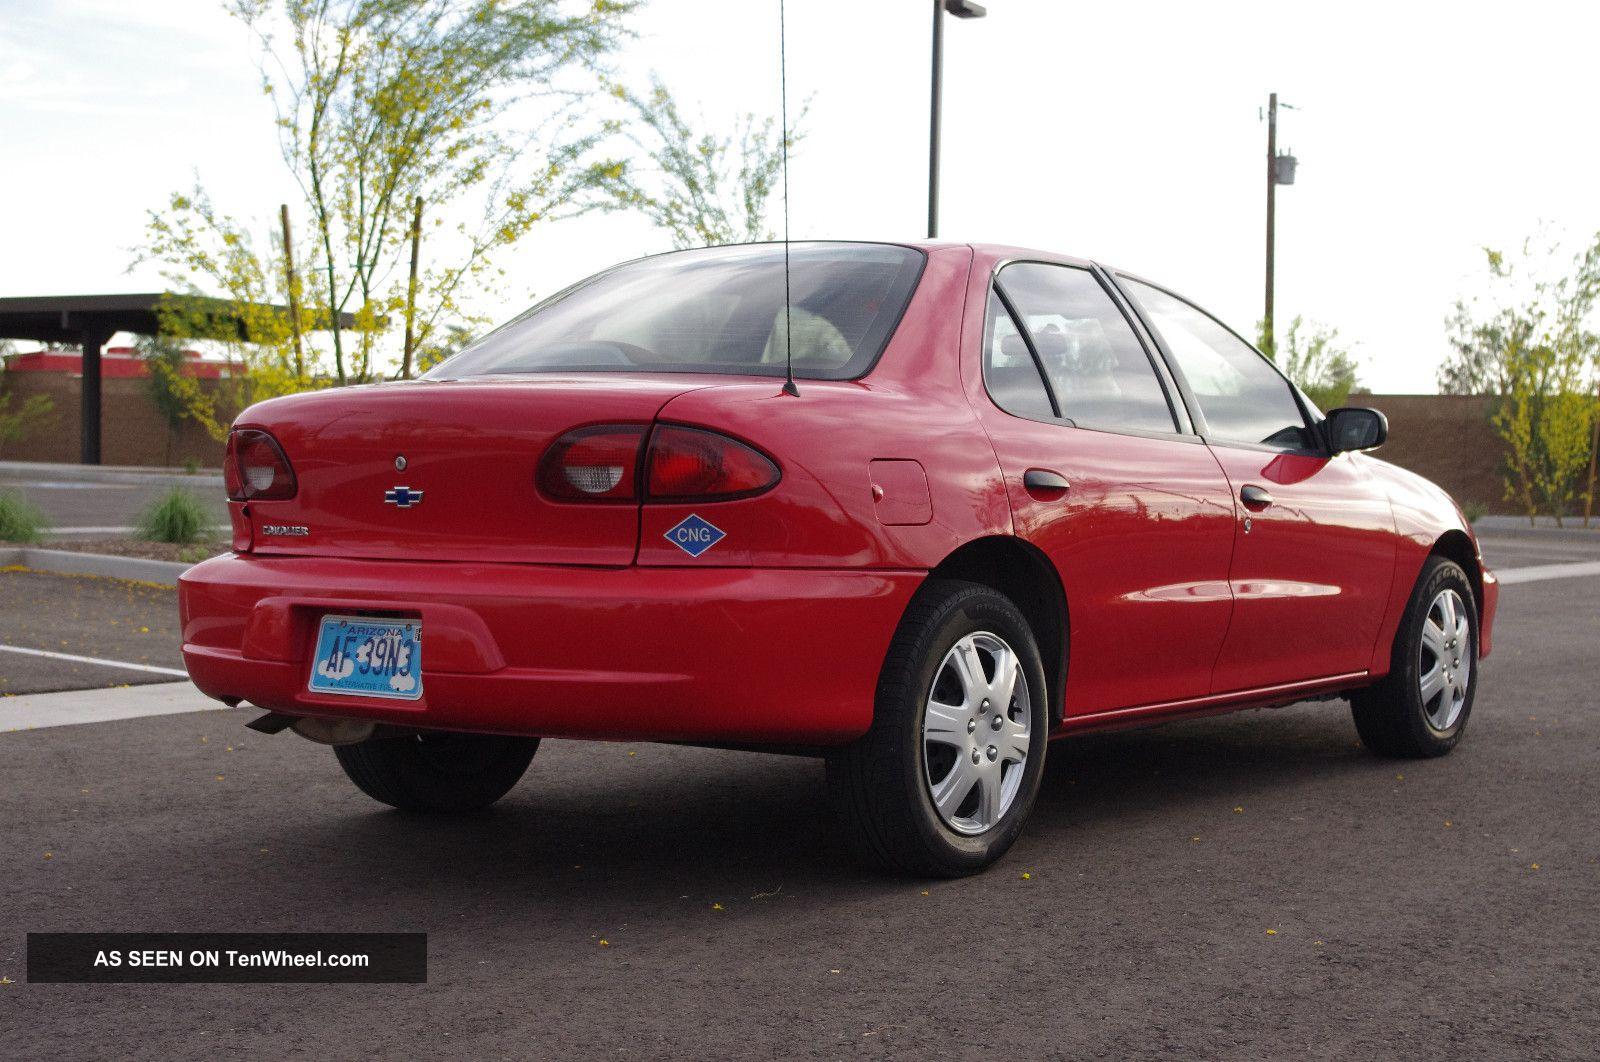 Chevrolet Cavalier Cng Bi Fuel Runs But Needs Engine Work Lgw